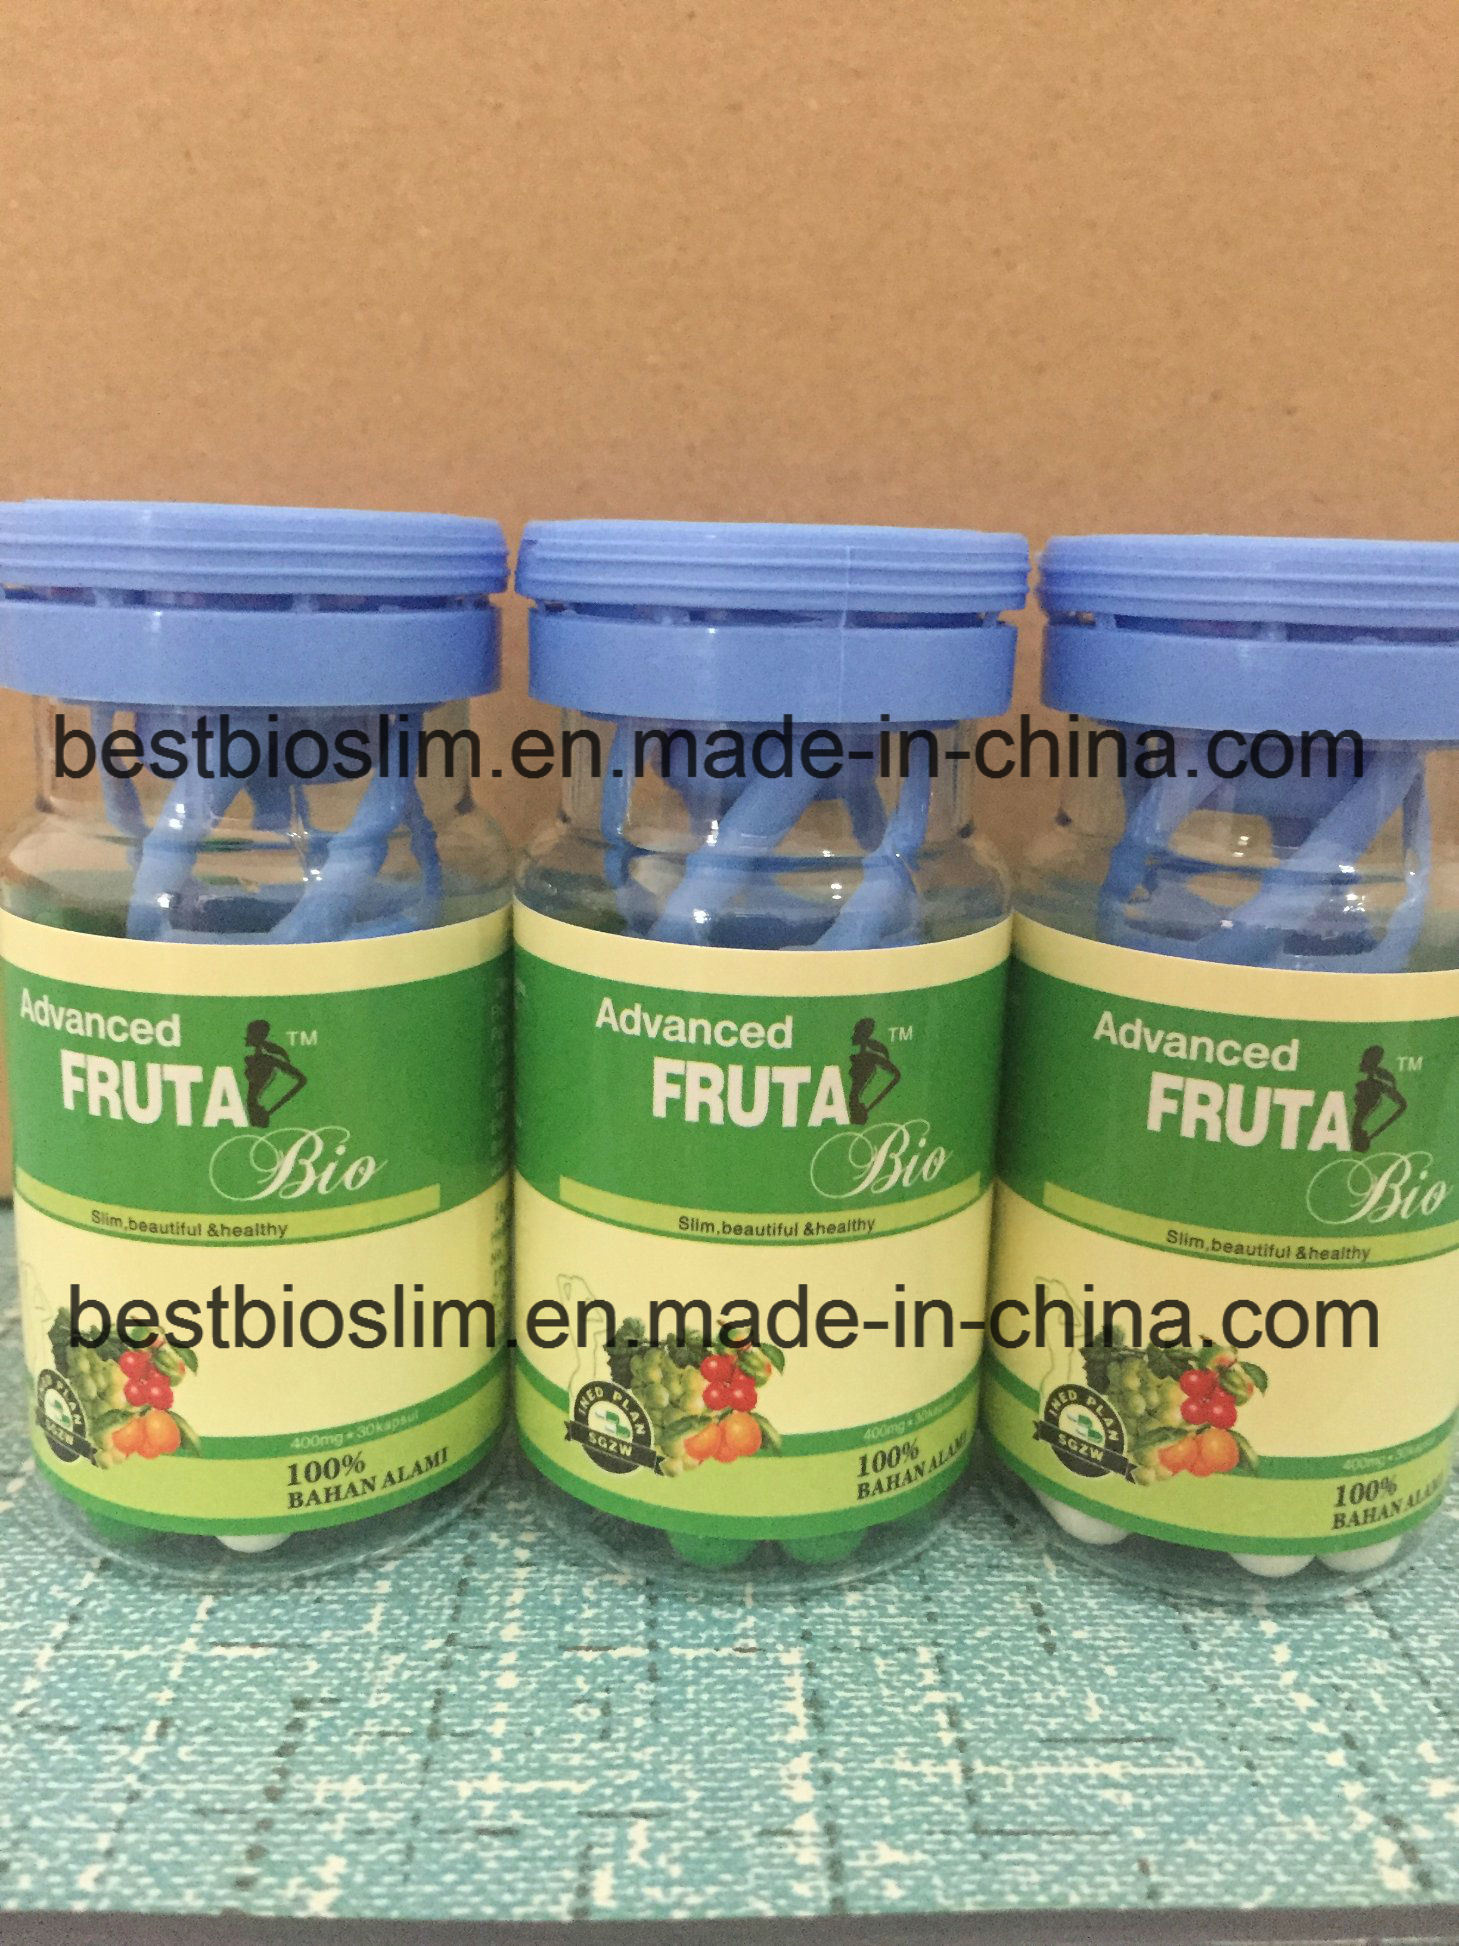 Advanced Fruta Bio Slimming Pills Green White Weight Loss Capsules